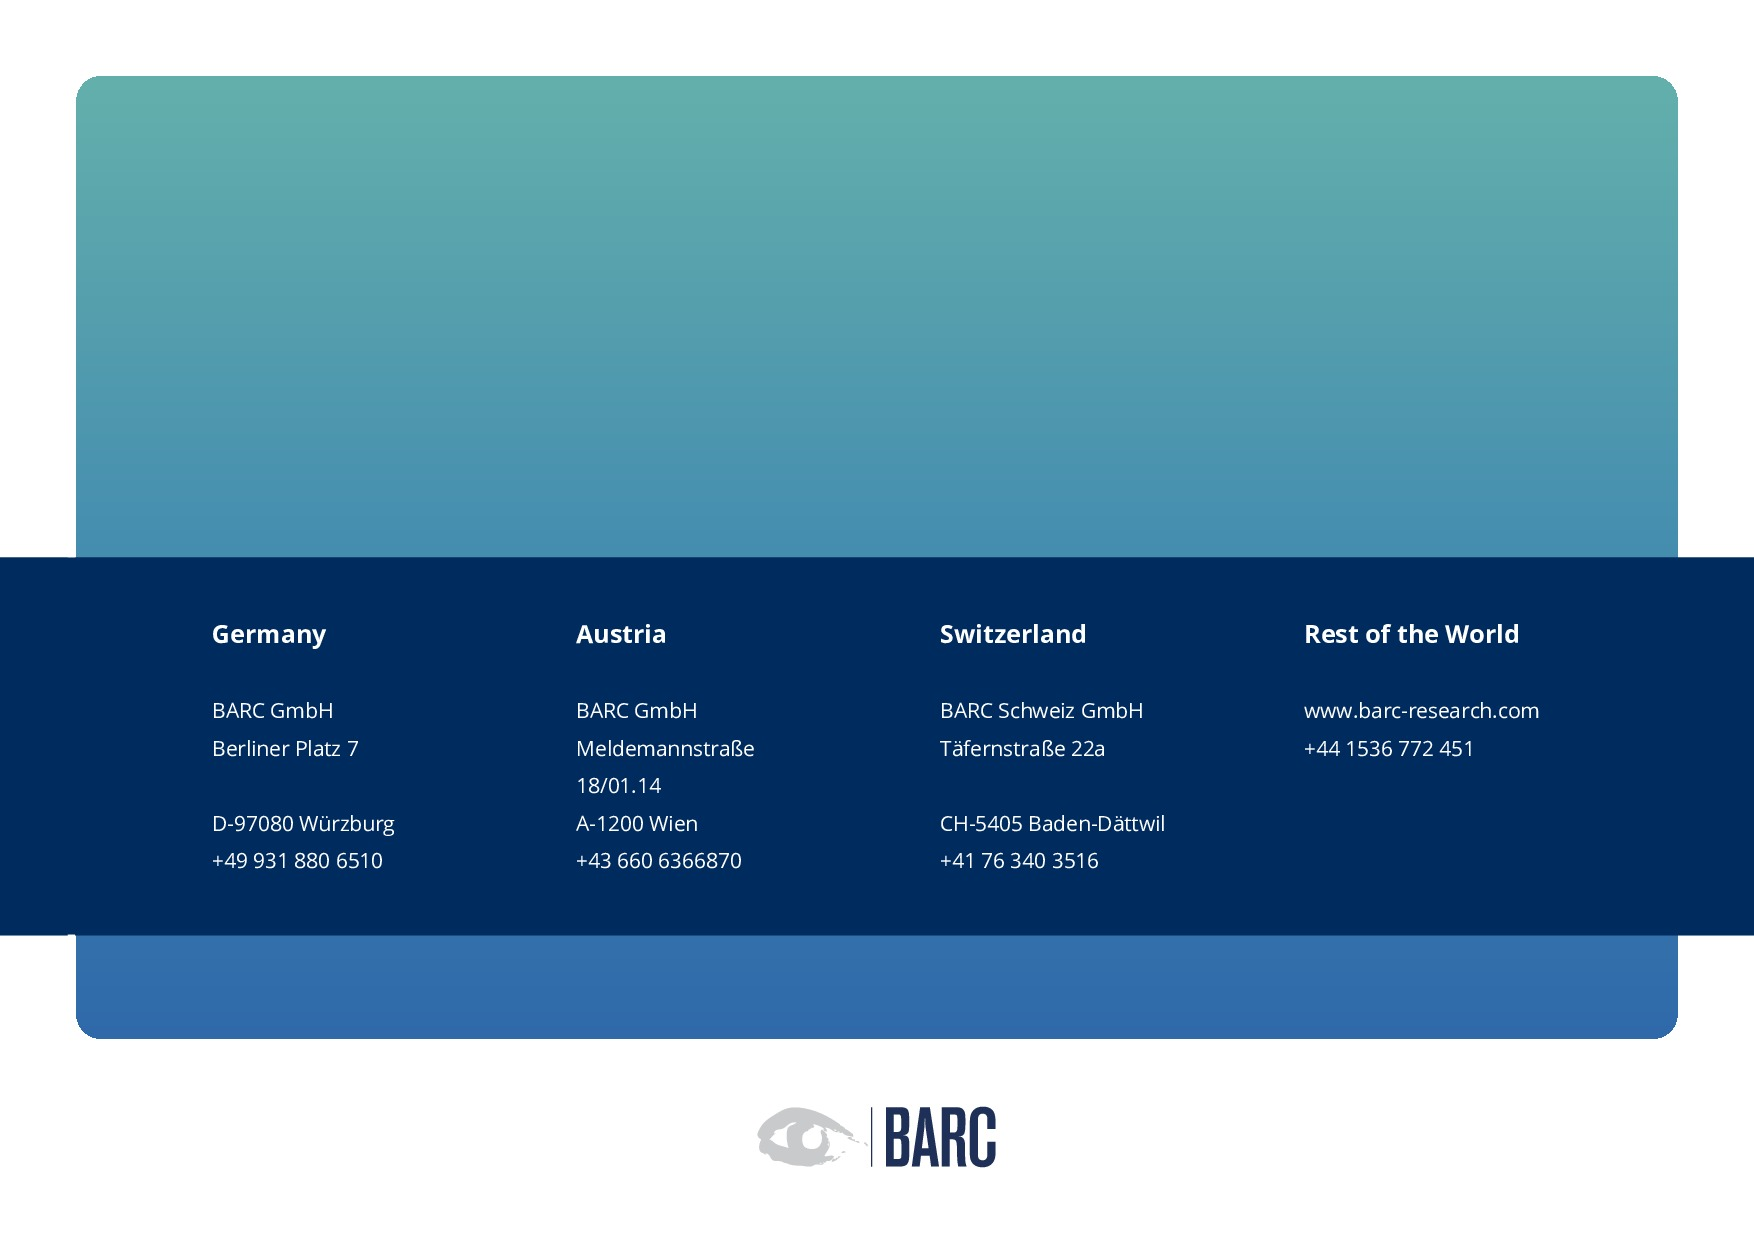 BARC – 統合と予測 – 経営計画の未来 | Page 36